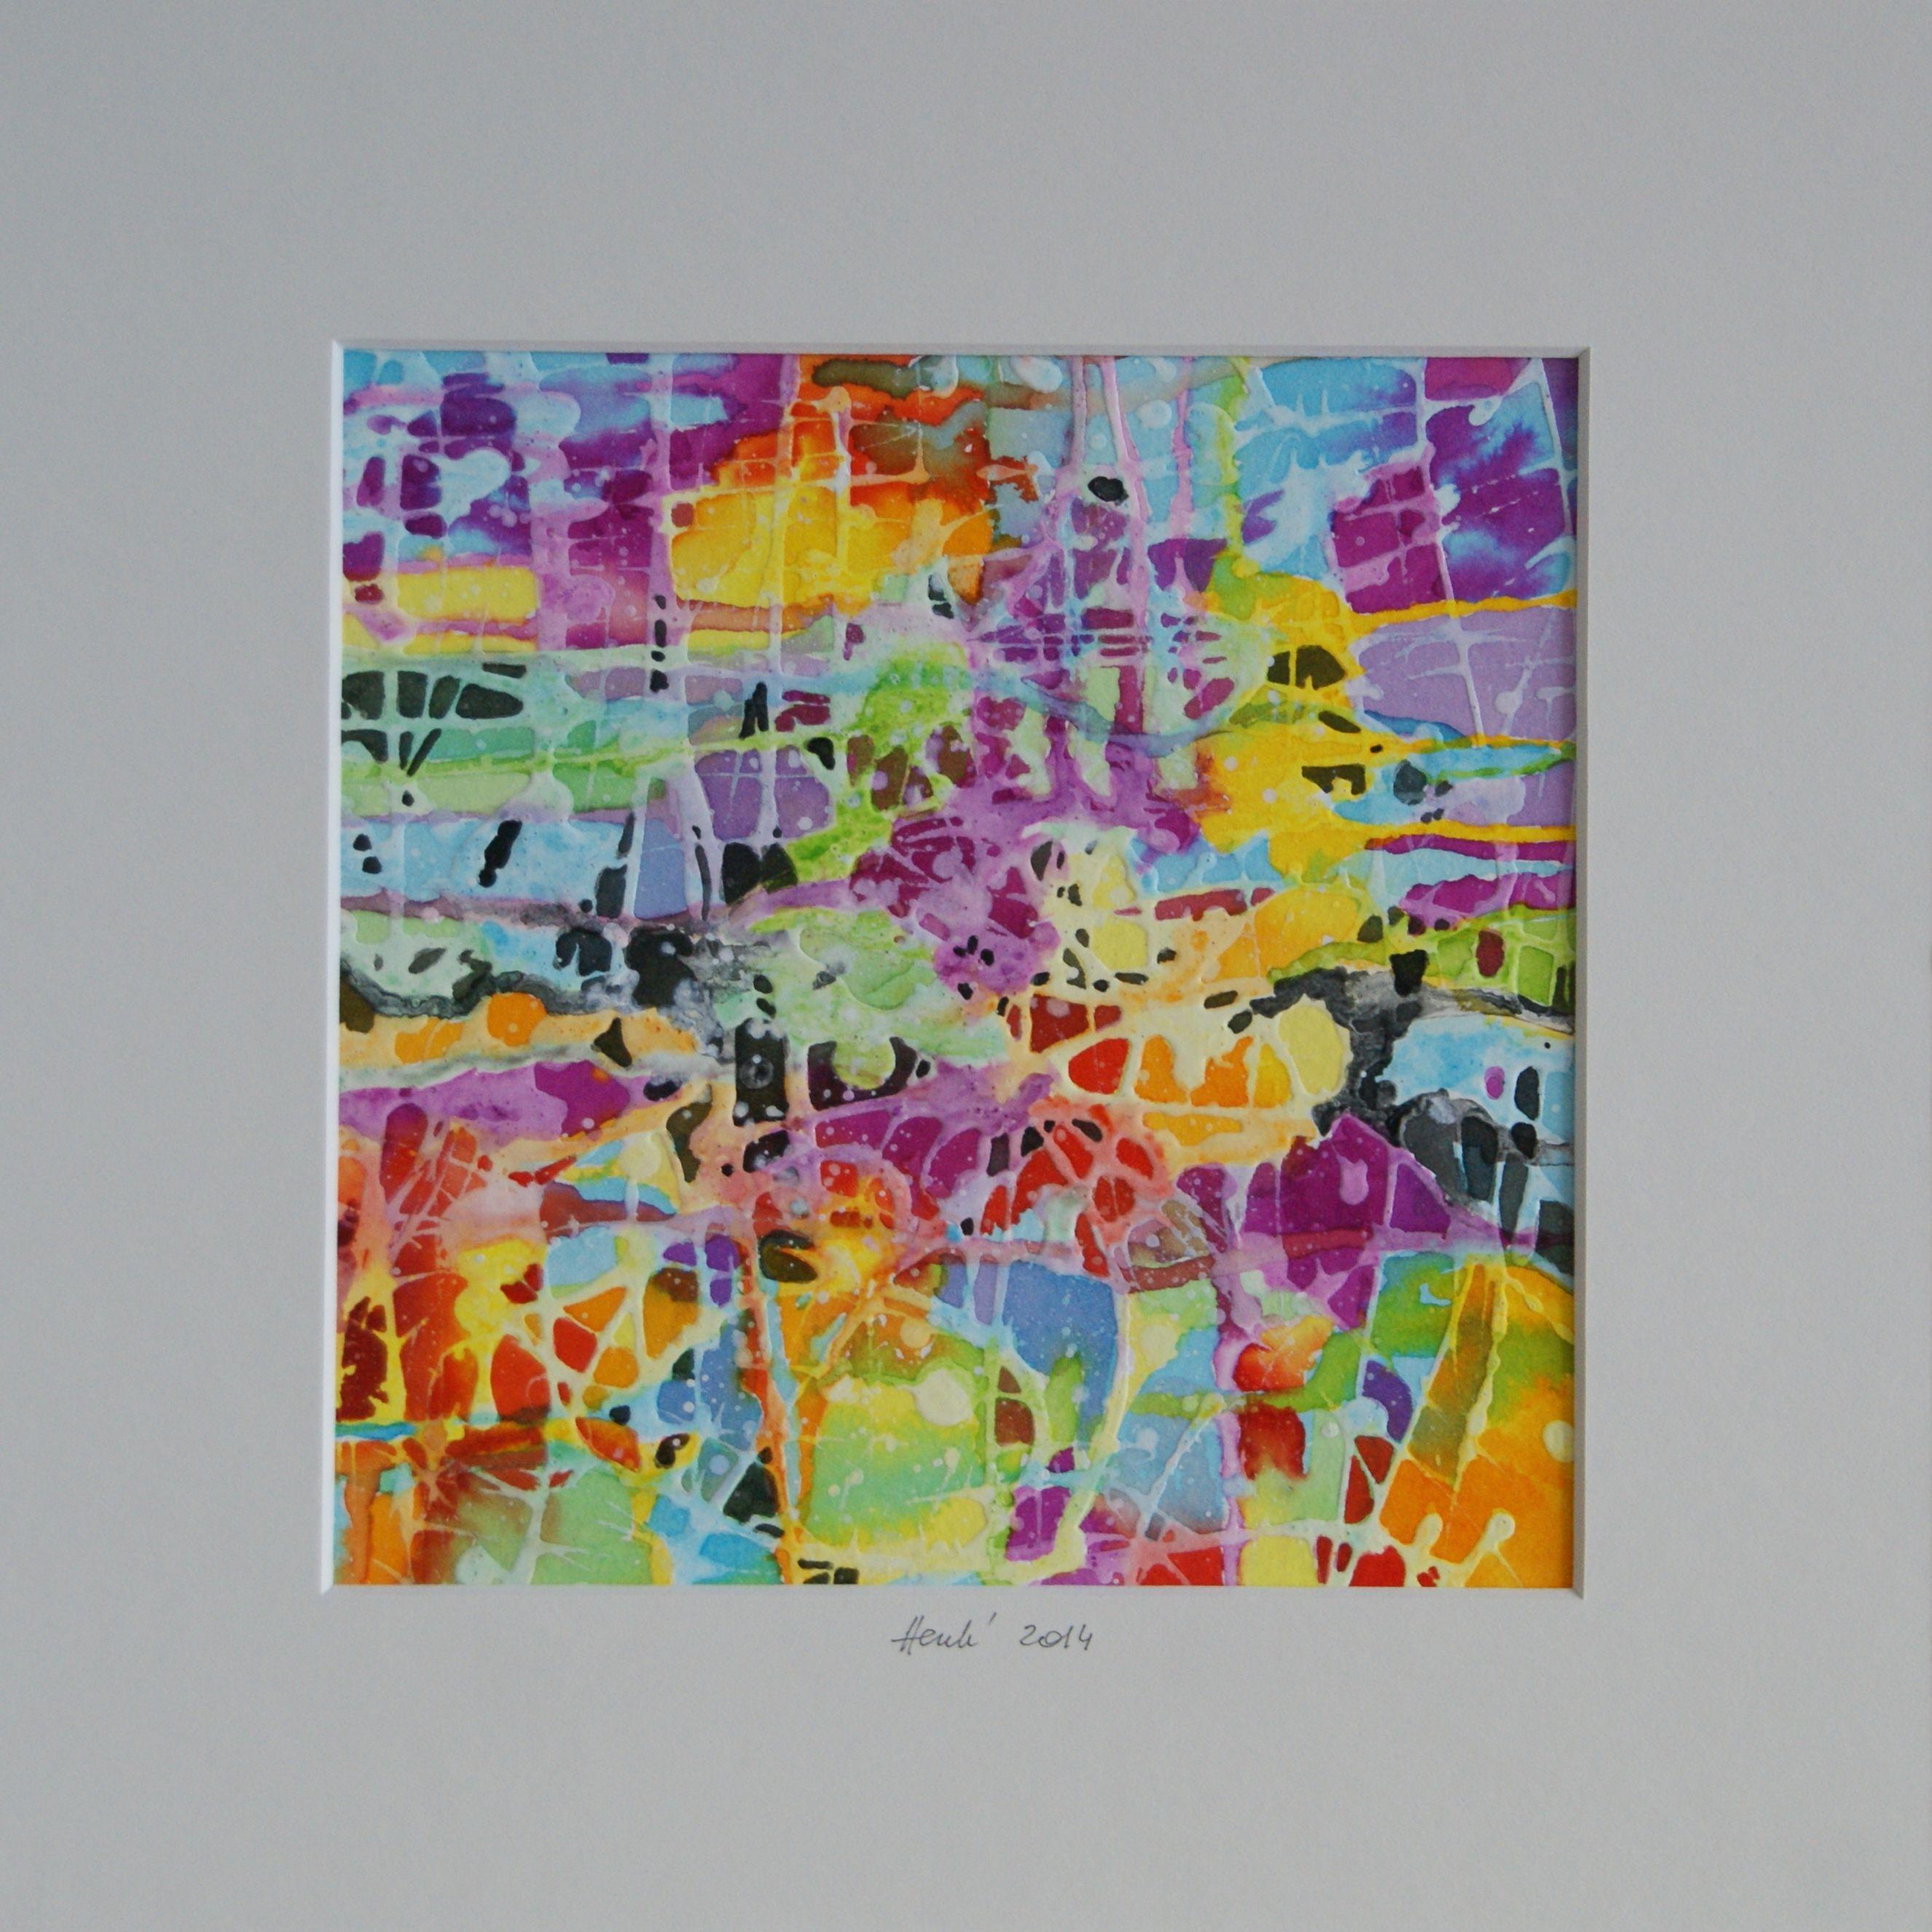 A'98, 30x30 cm, 2014 by Dorota Henk